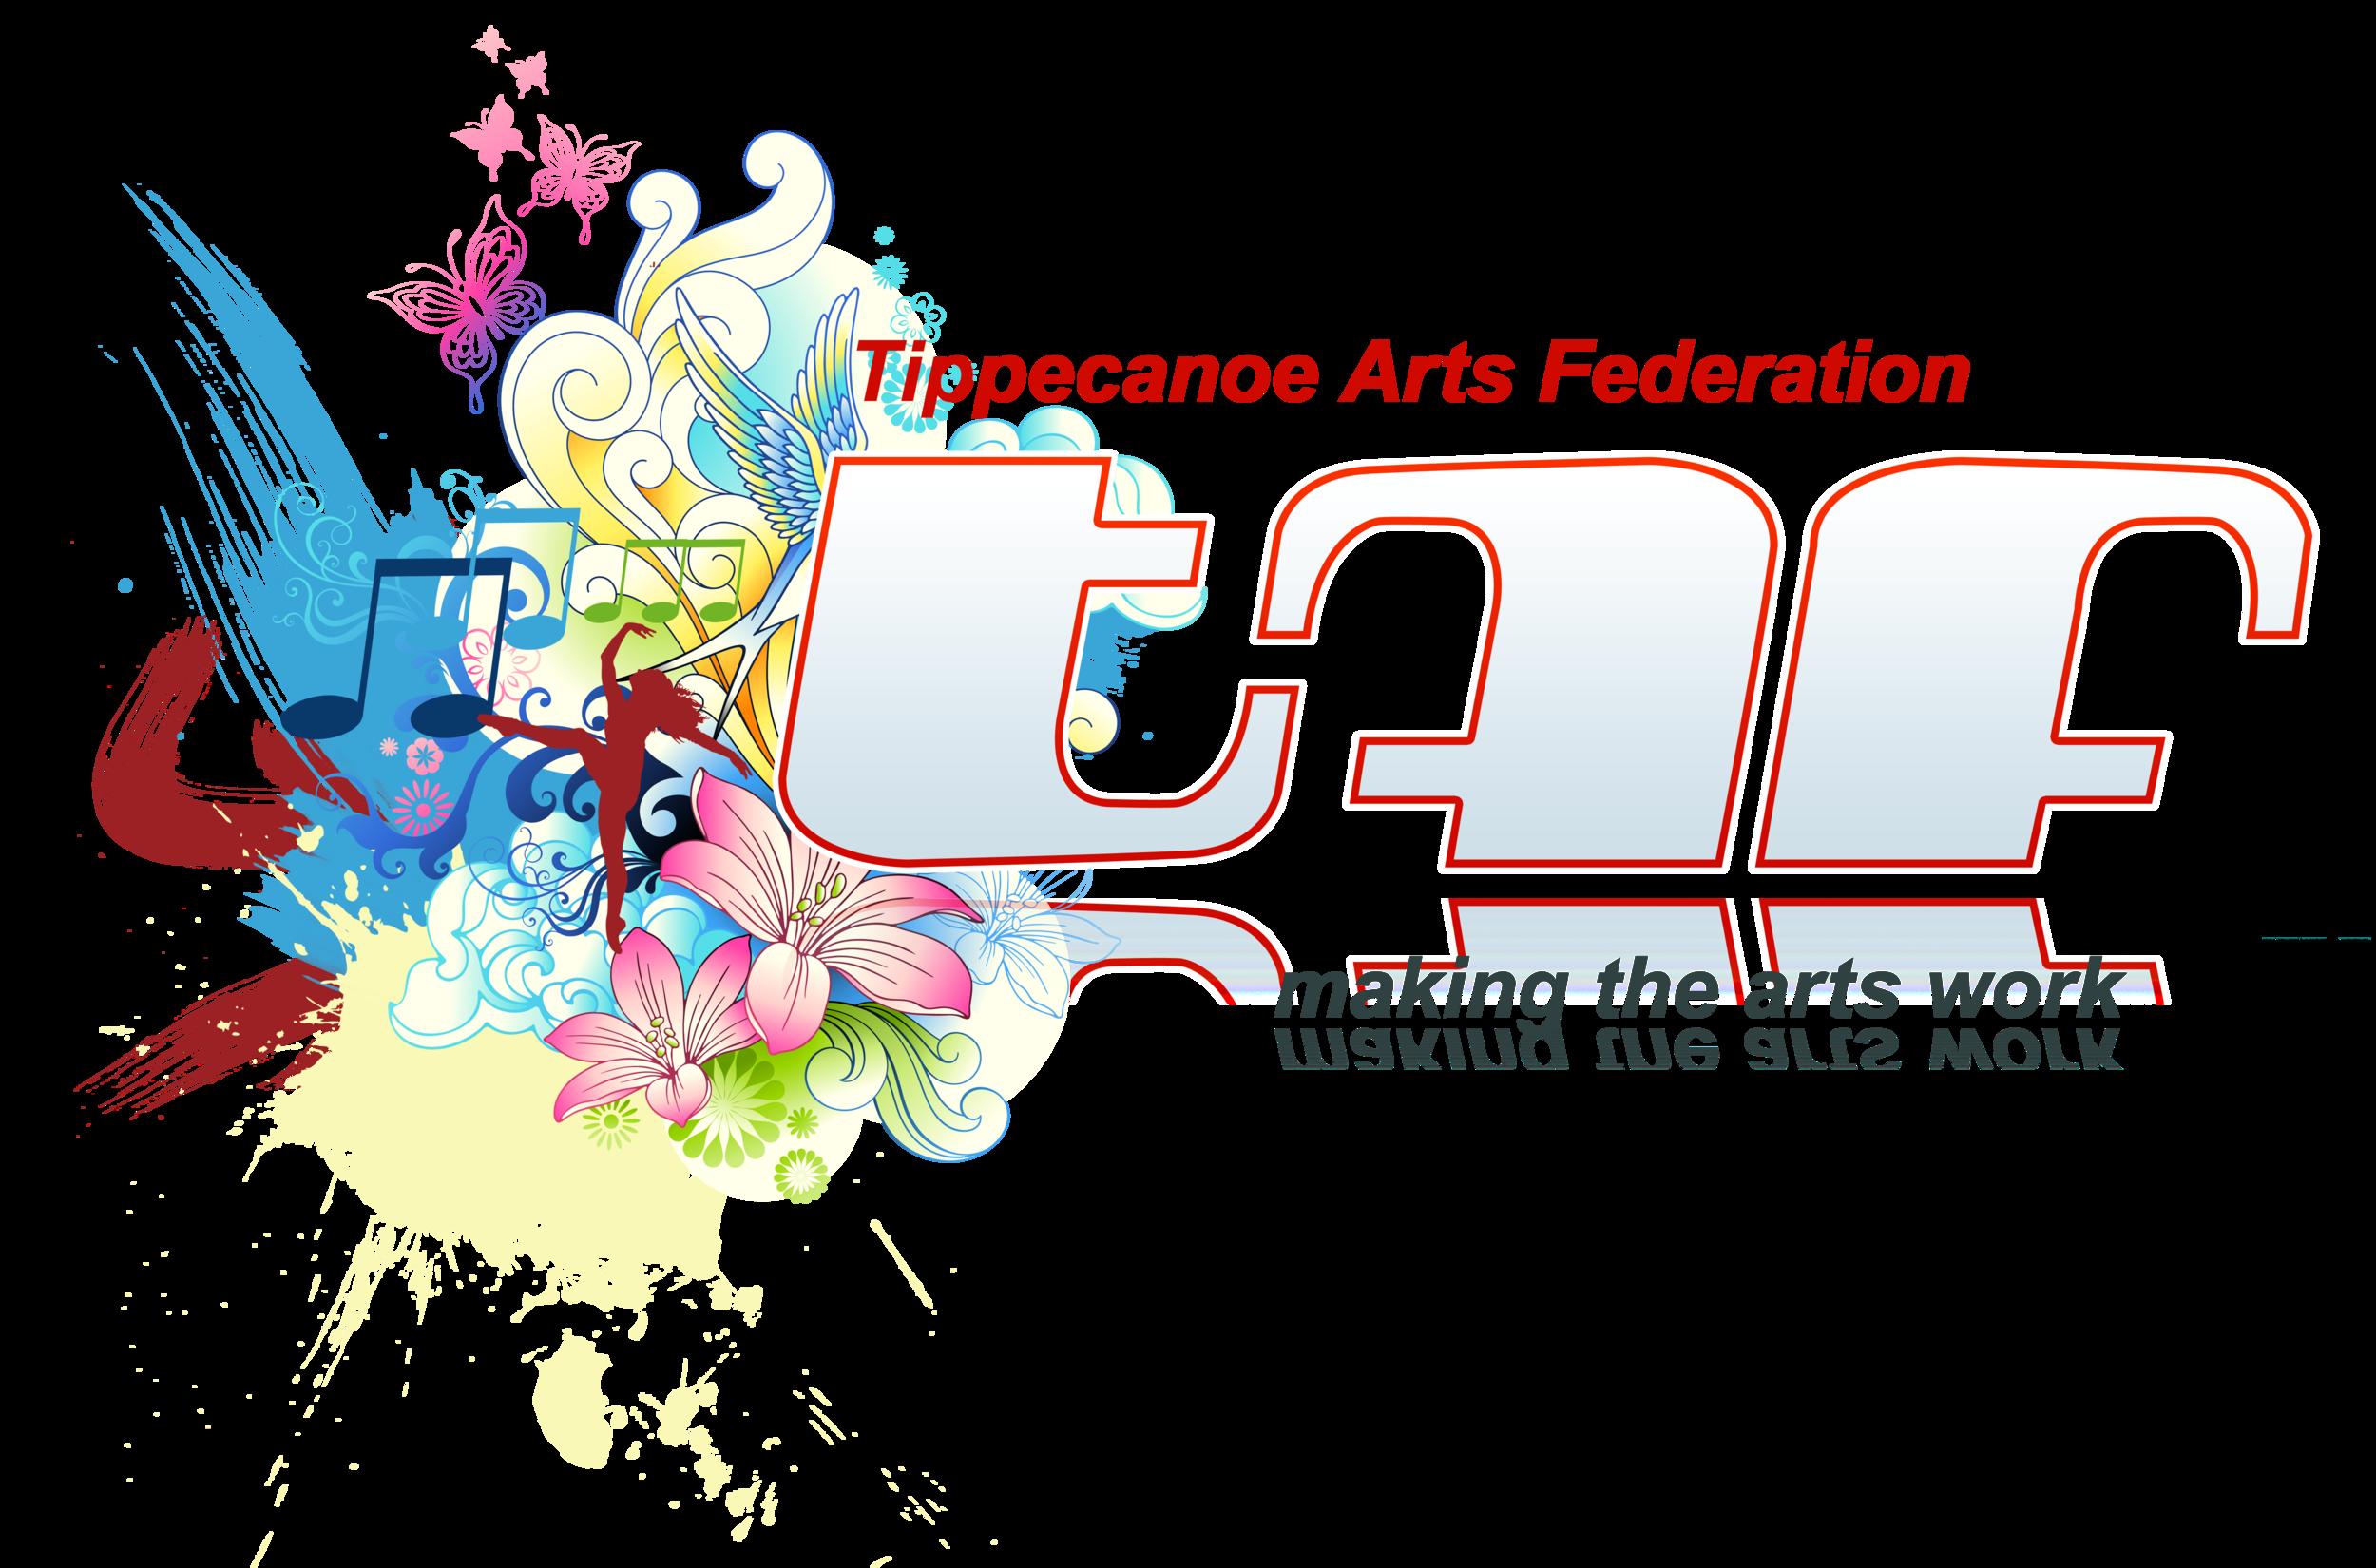 TAF_Logo tag belowtransparentbackground.png